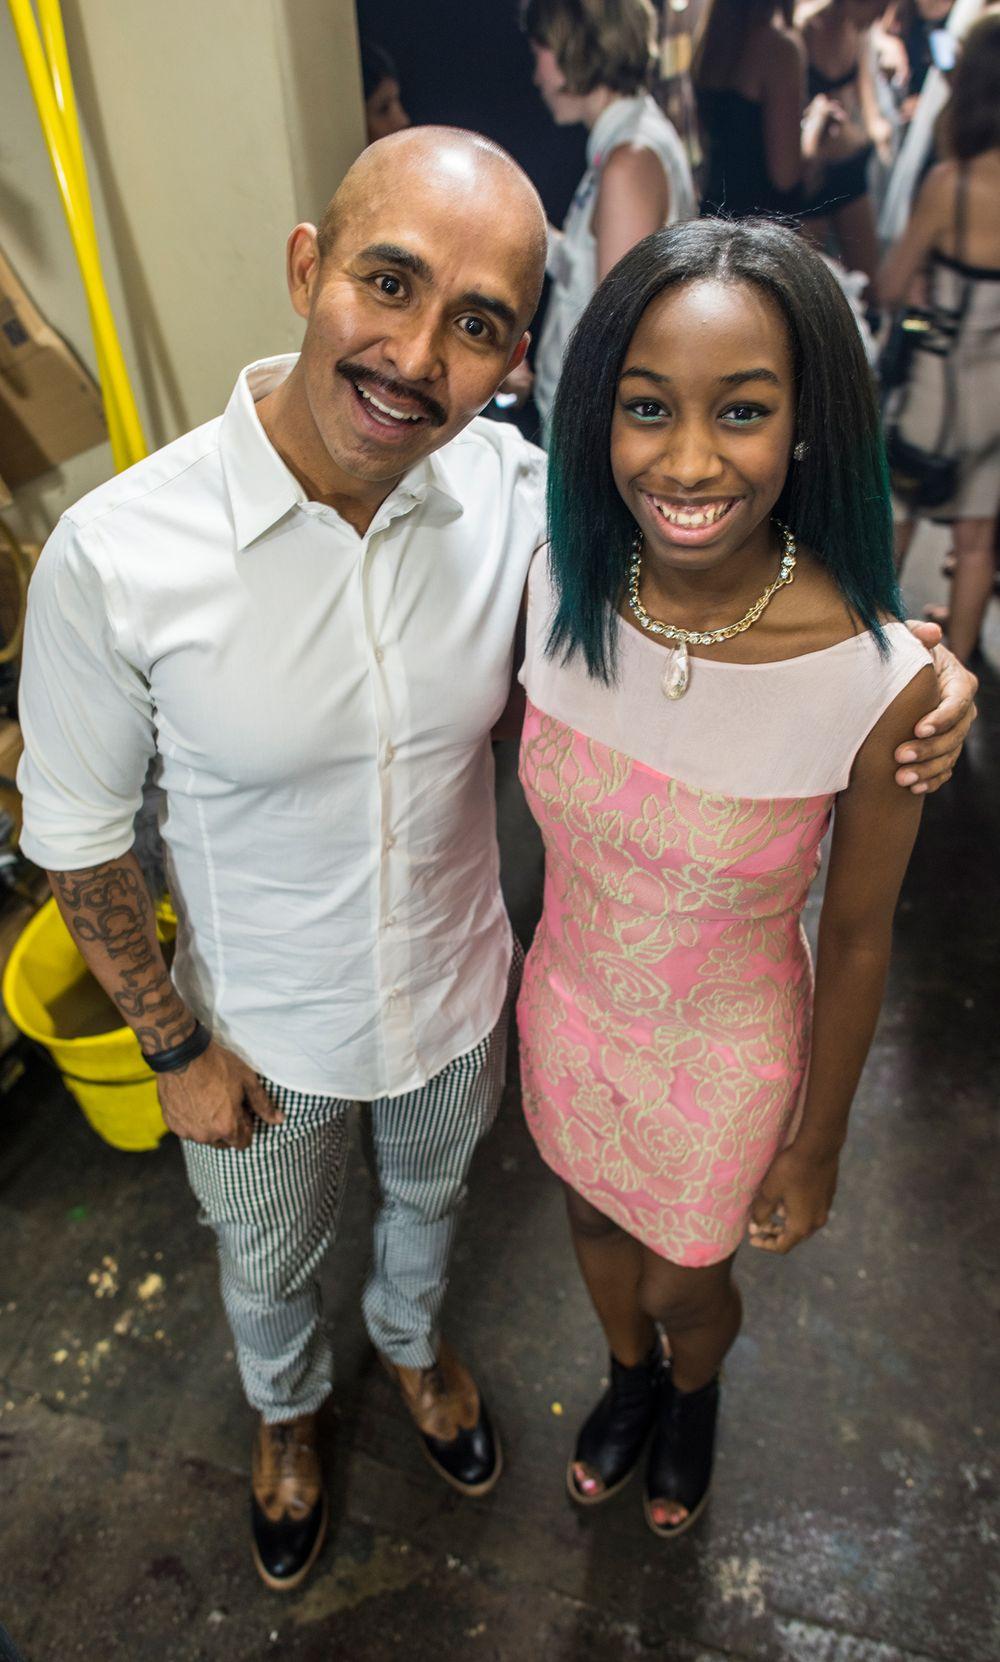 <p>Designer Raul Penaranda and Polished Girlz founder Alanna Wall.&nbsp;Photo courtesy of Samantha Morales Photography.&nbsp;</p>